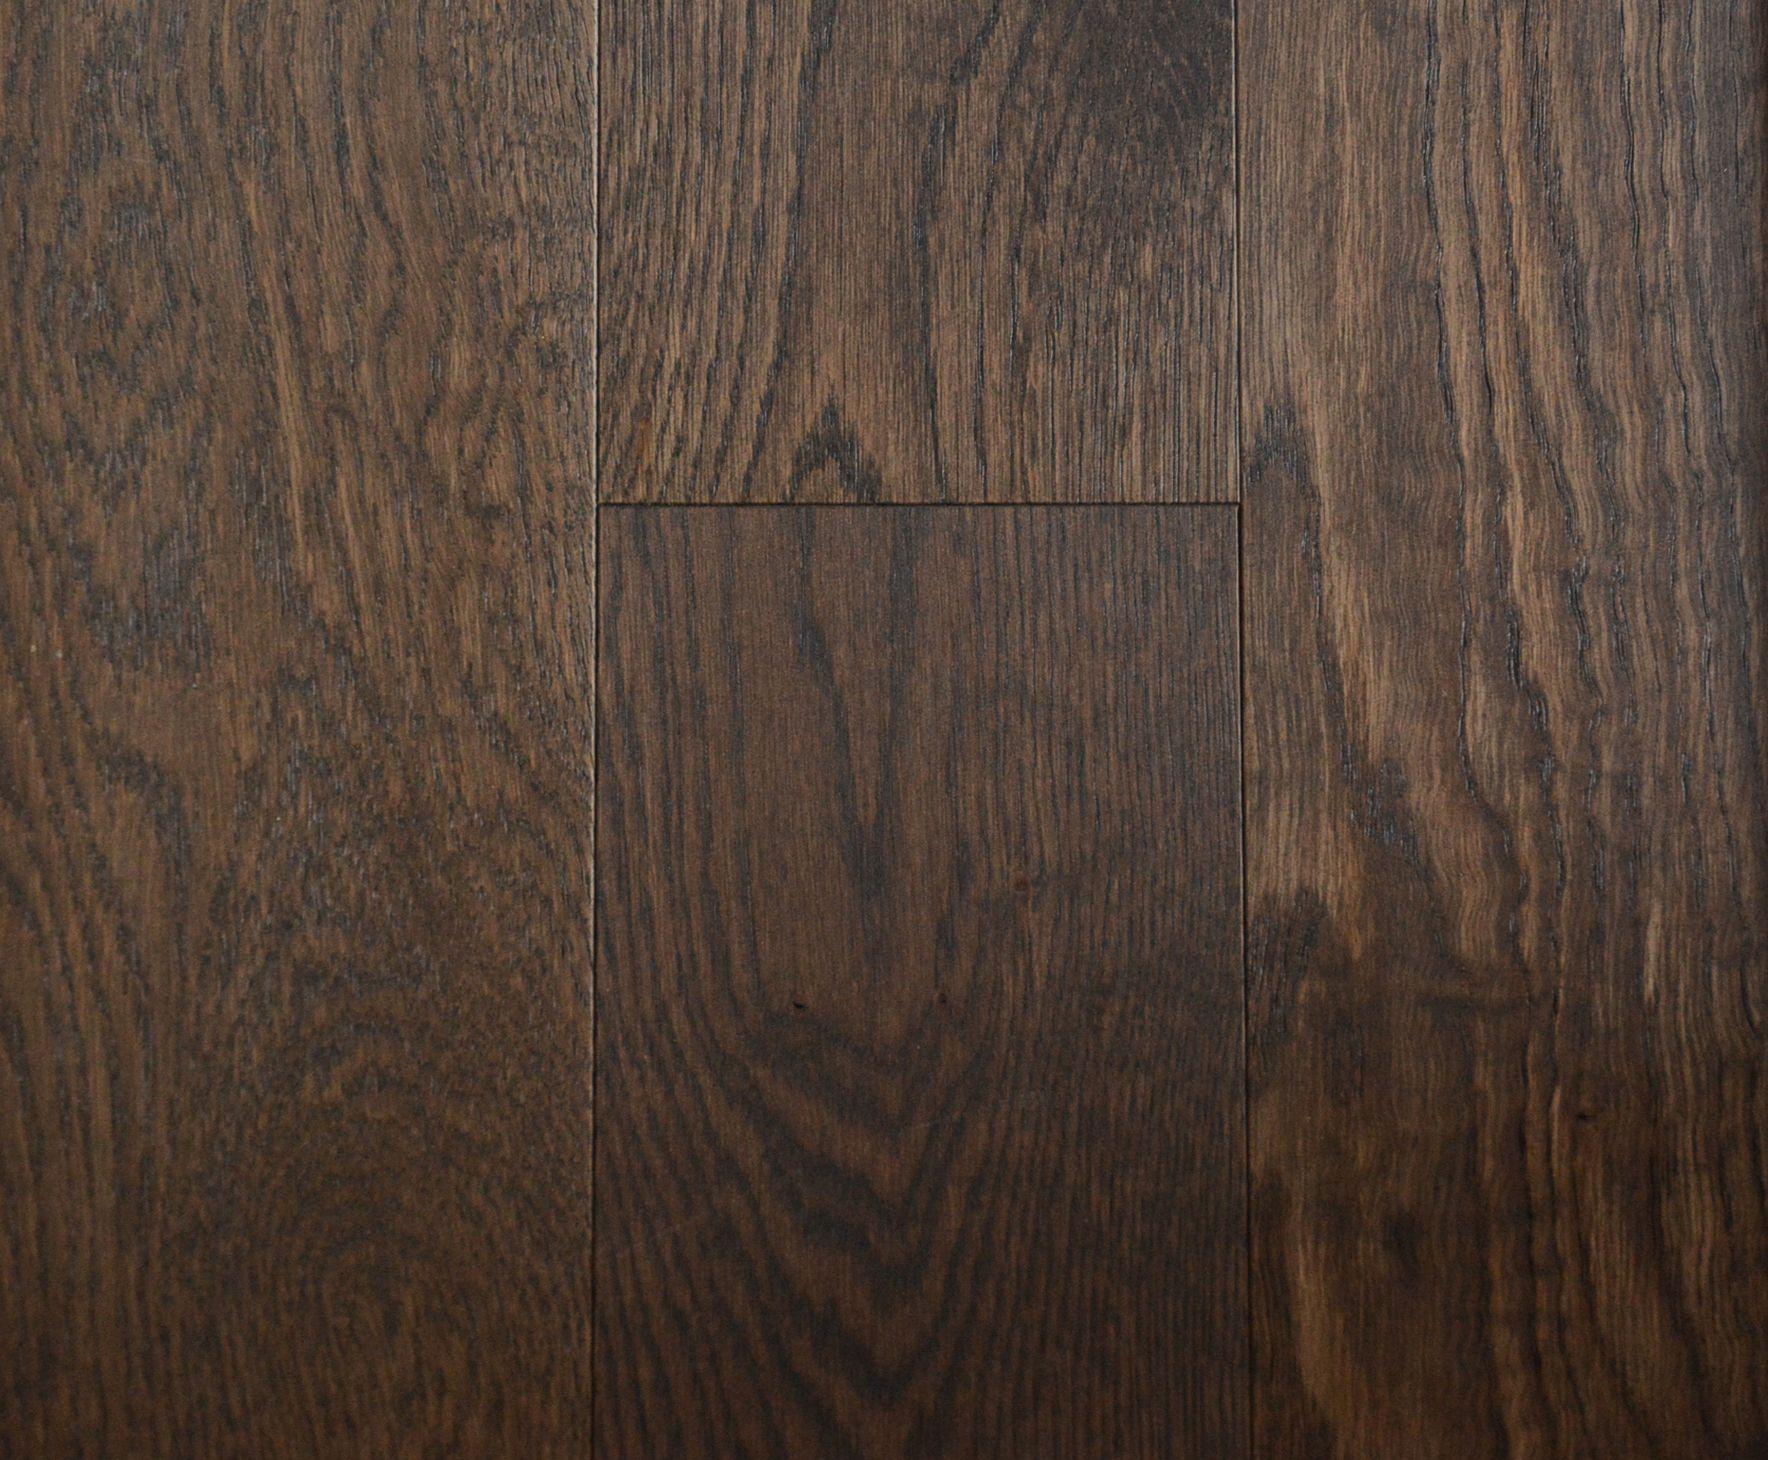 Hardwood Flooring Signature Plain Sawn Wire Brushed Texture Uv Oil Finish White